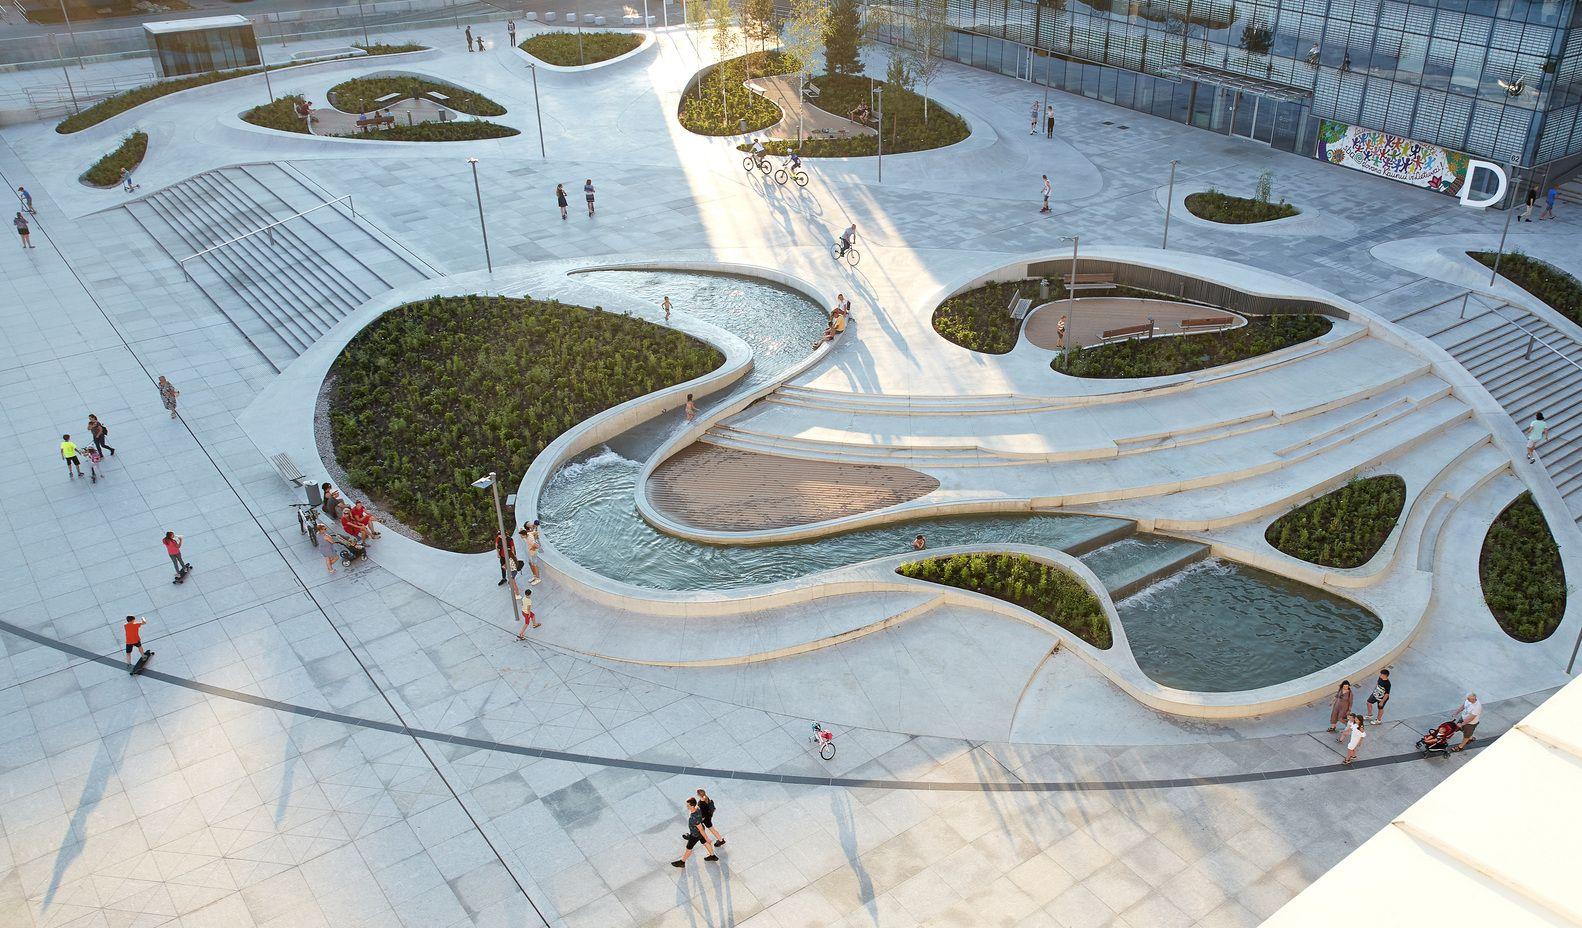 Gallery of V-Plaza Urban Development / 3deluxe architecture - 29